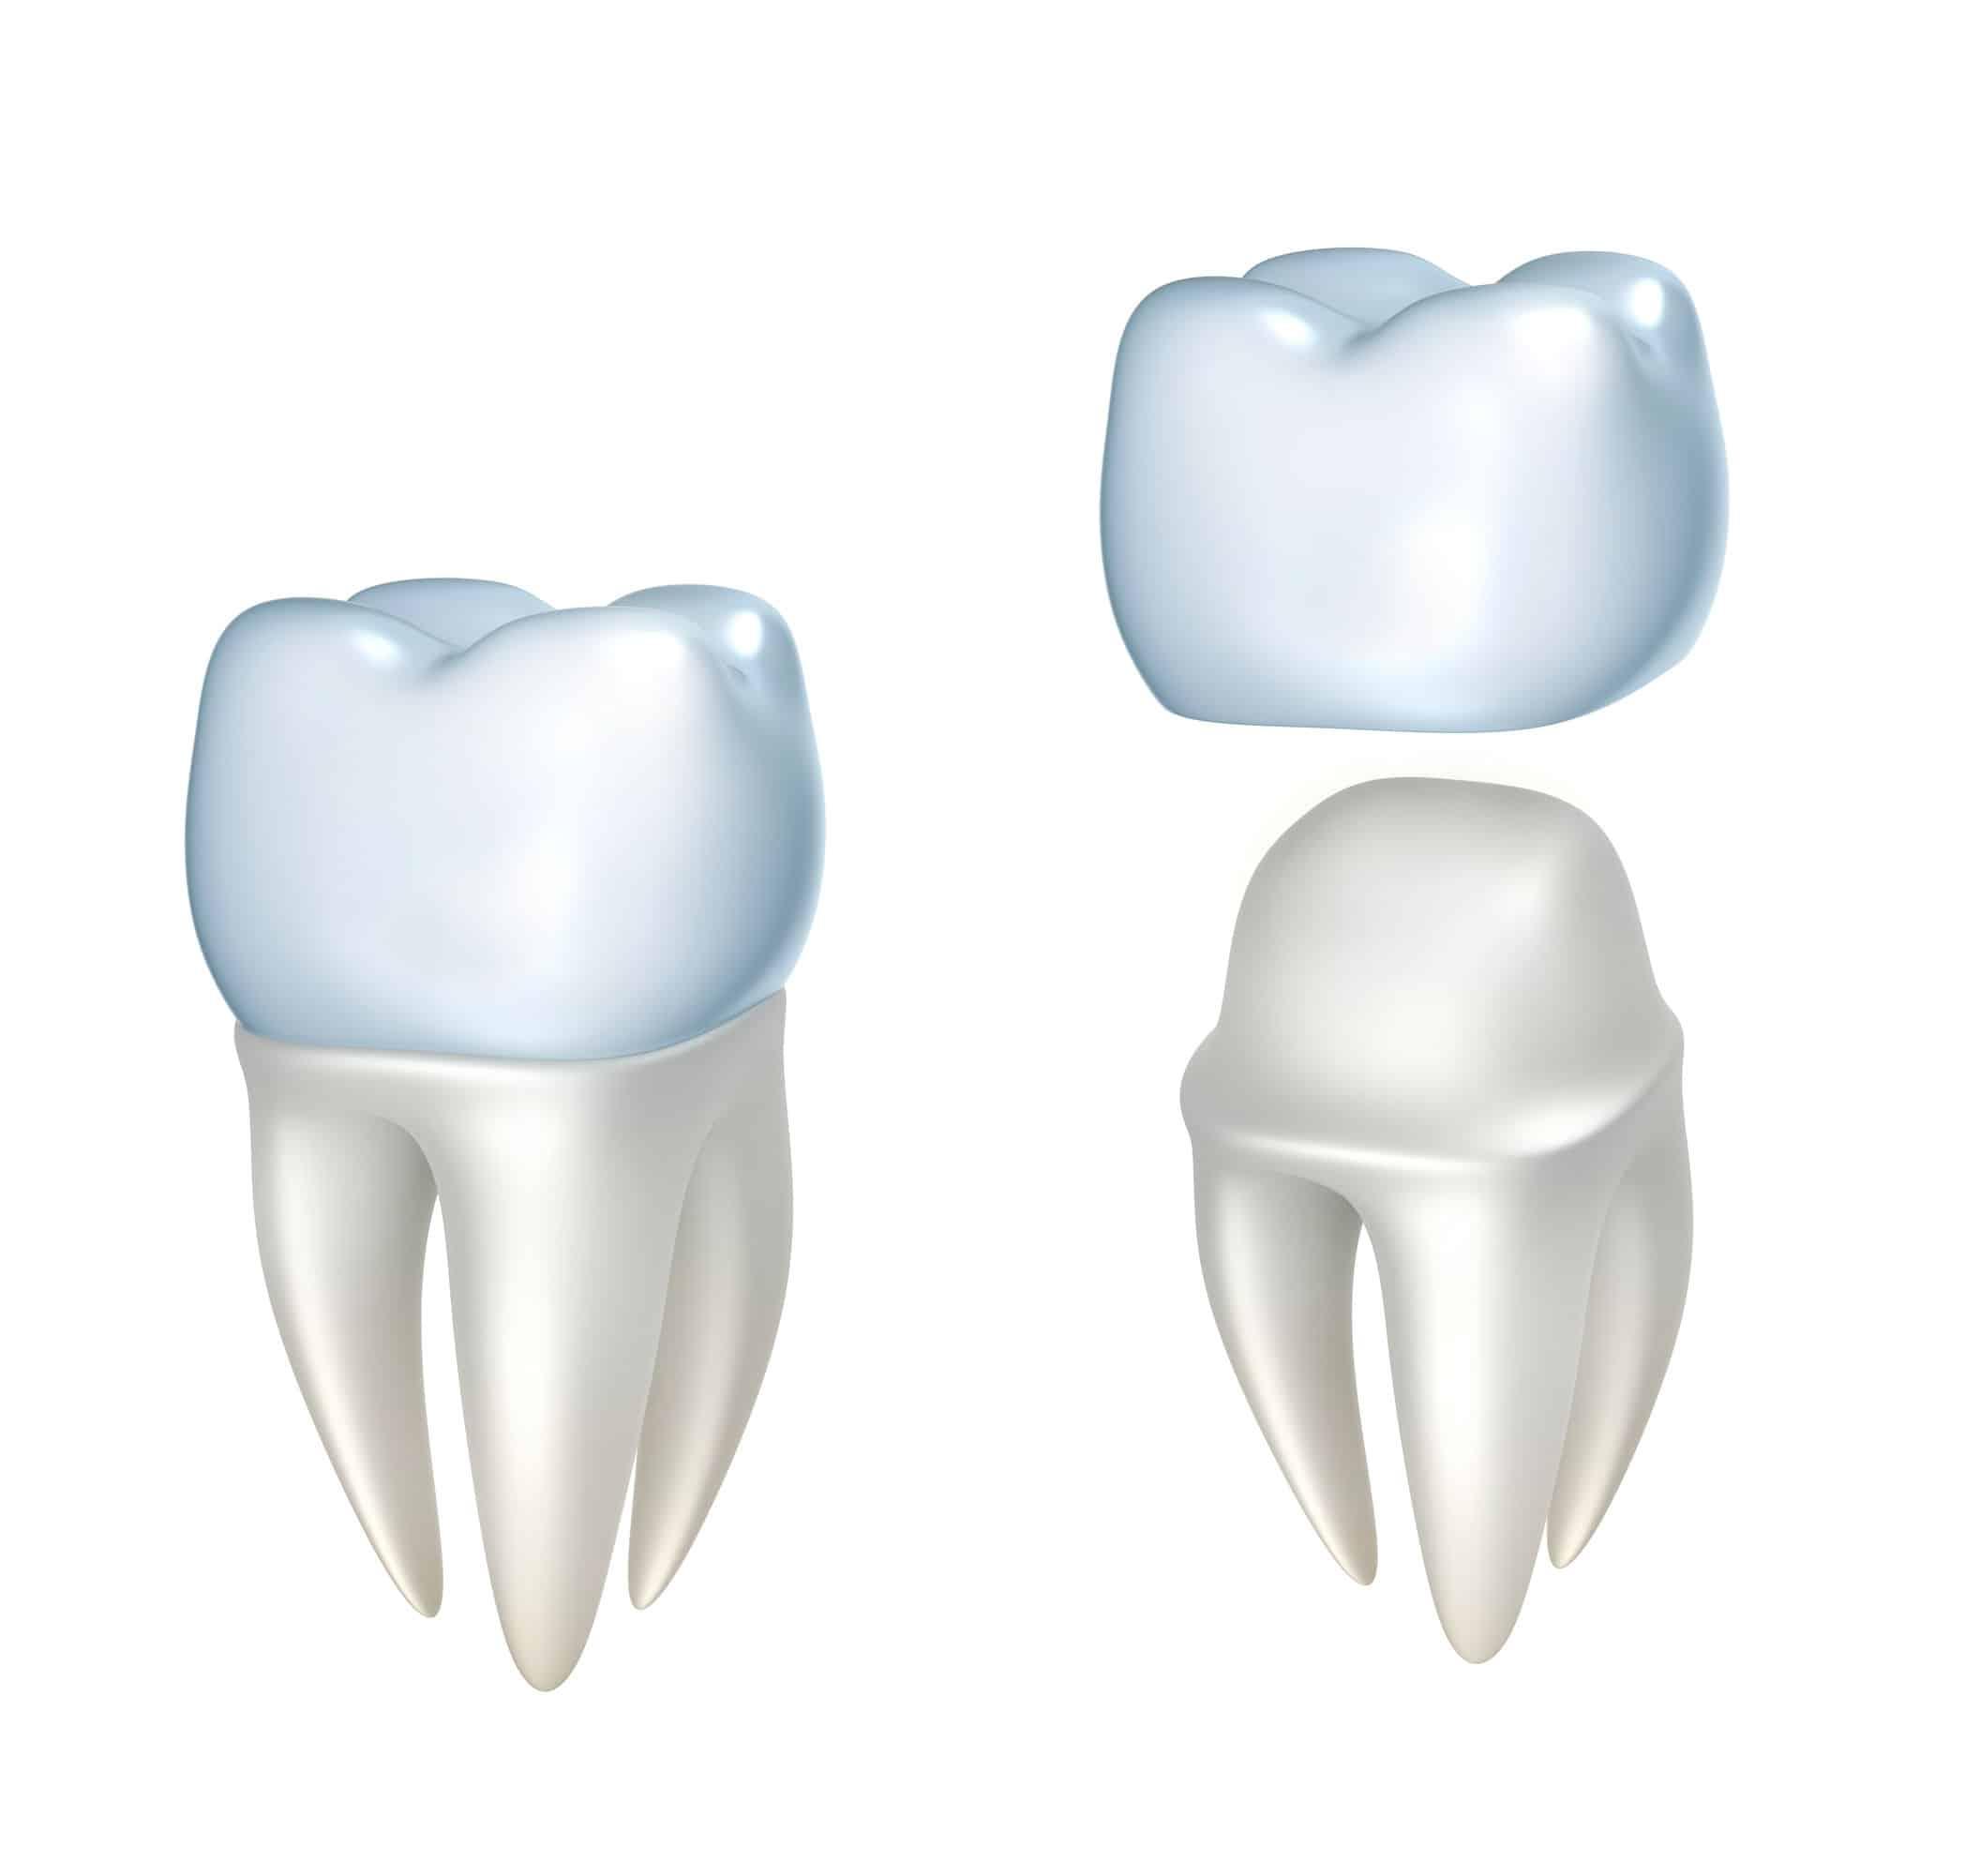 dental crown tulsa, ok